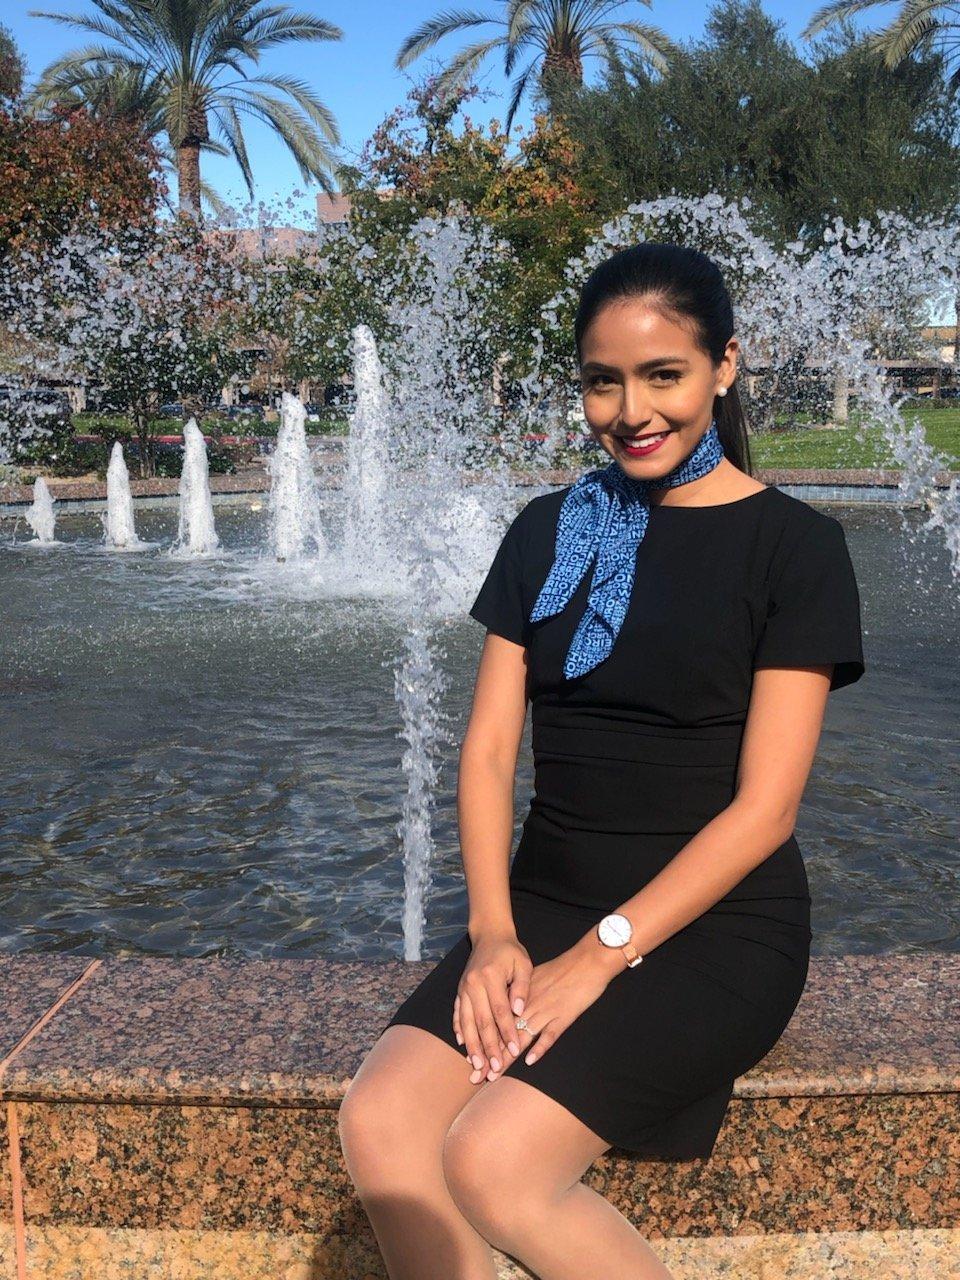 A recent photo of Selene Saavedra Roman that her husband took of her in her flight attendant uniform.